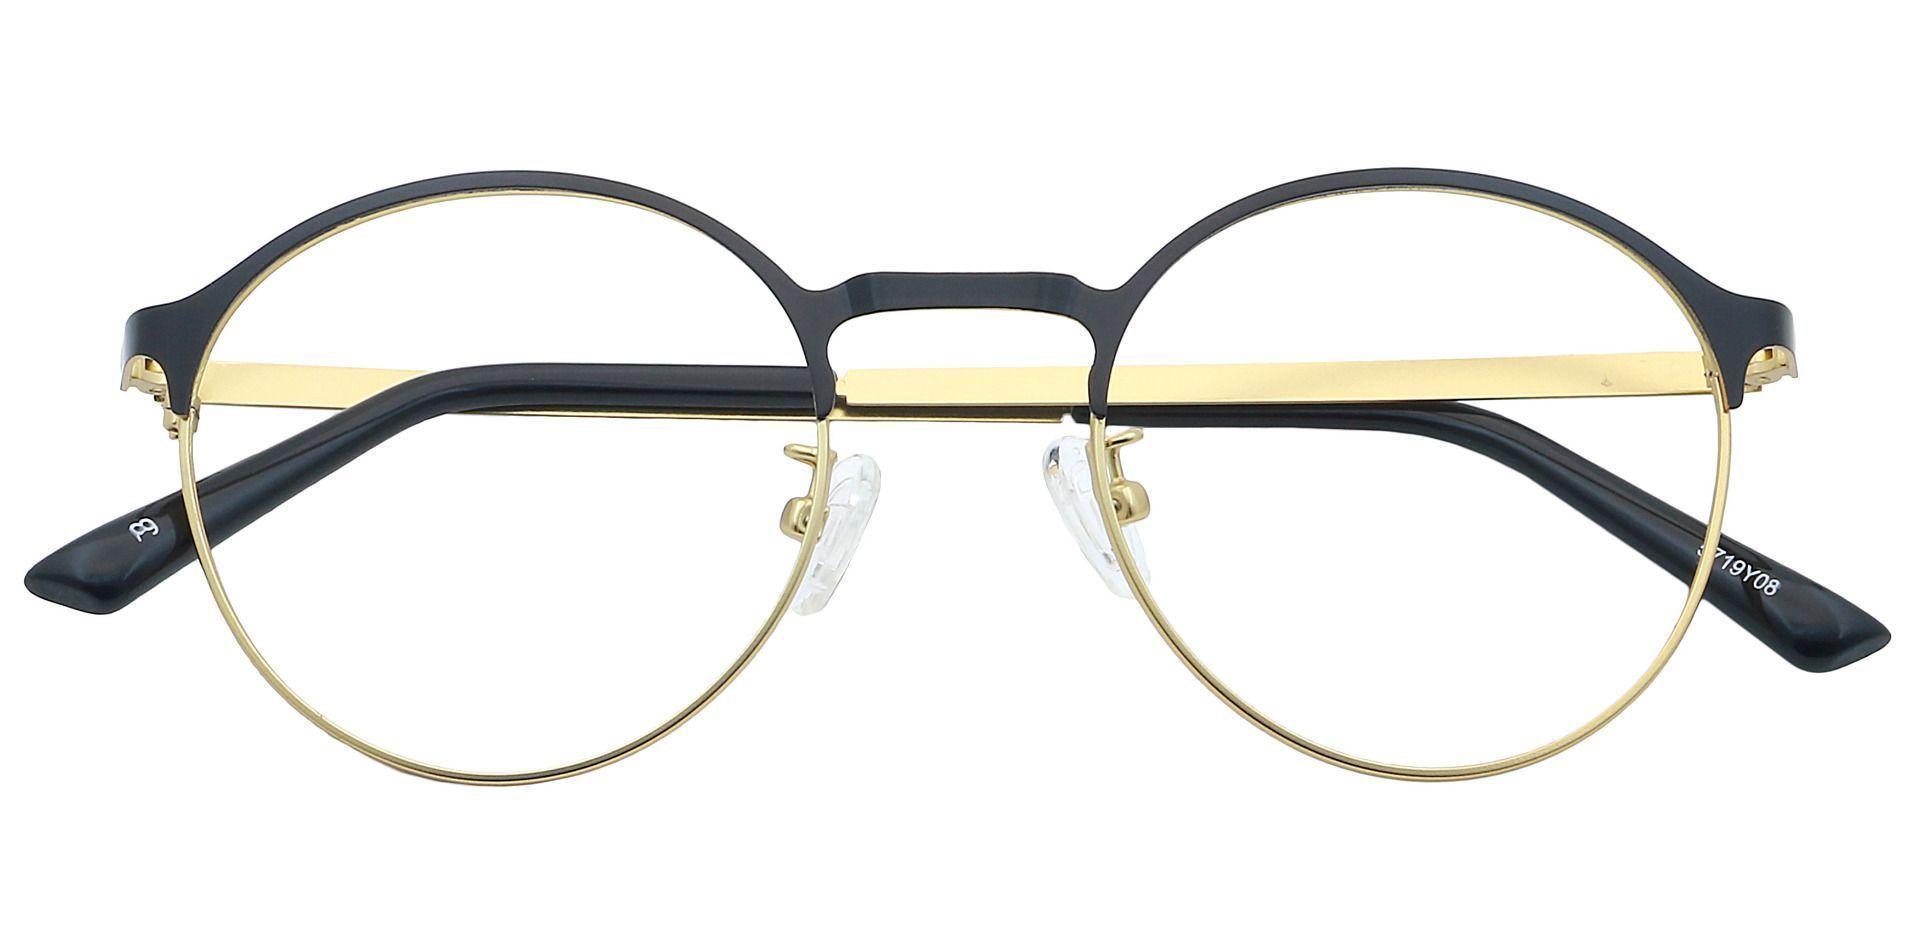 Perry Round Eyeglasses Frame - Yellow